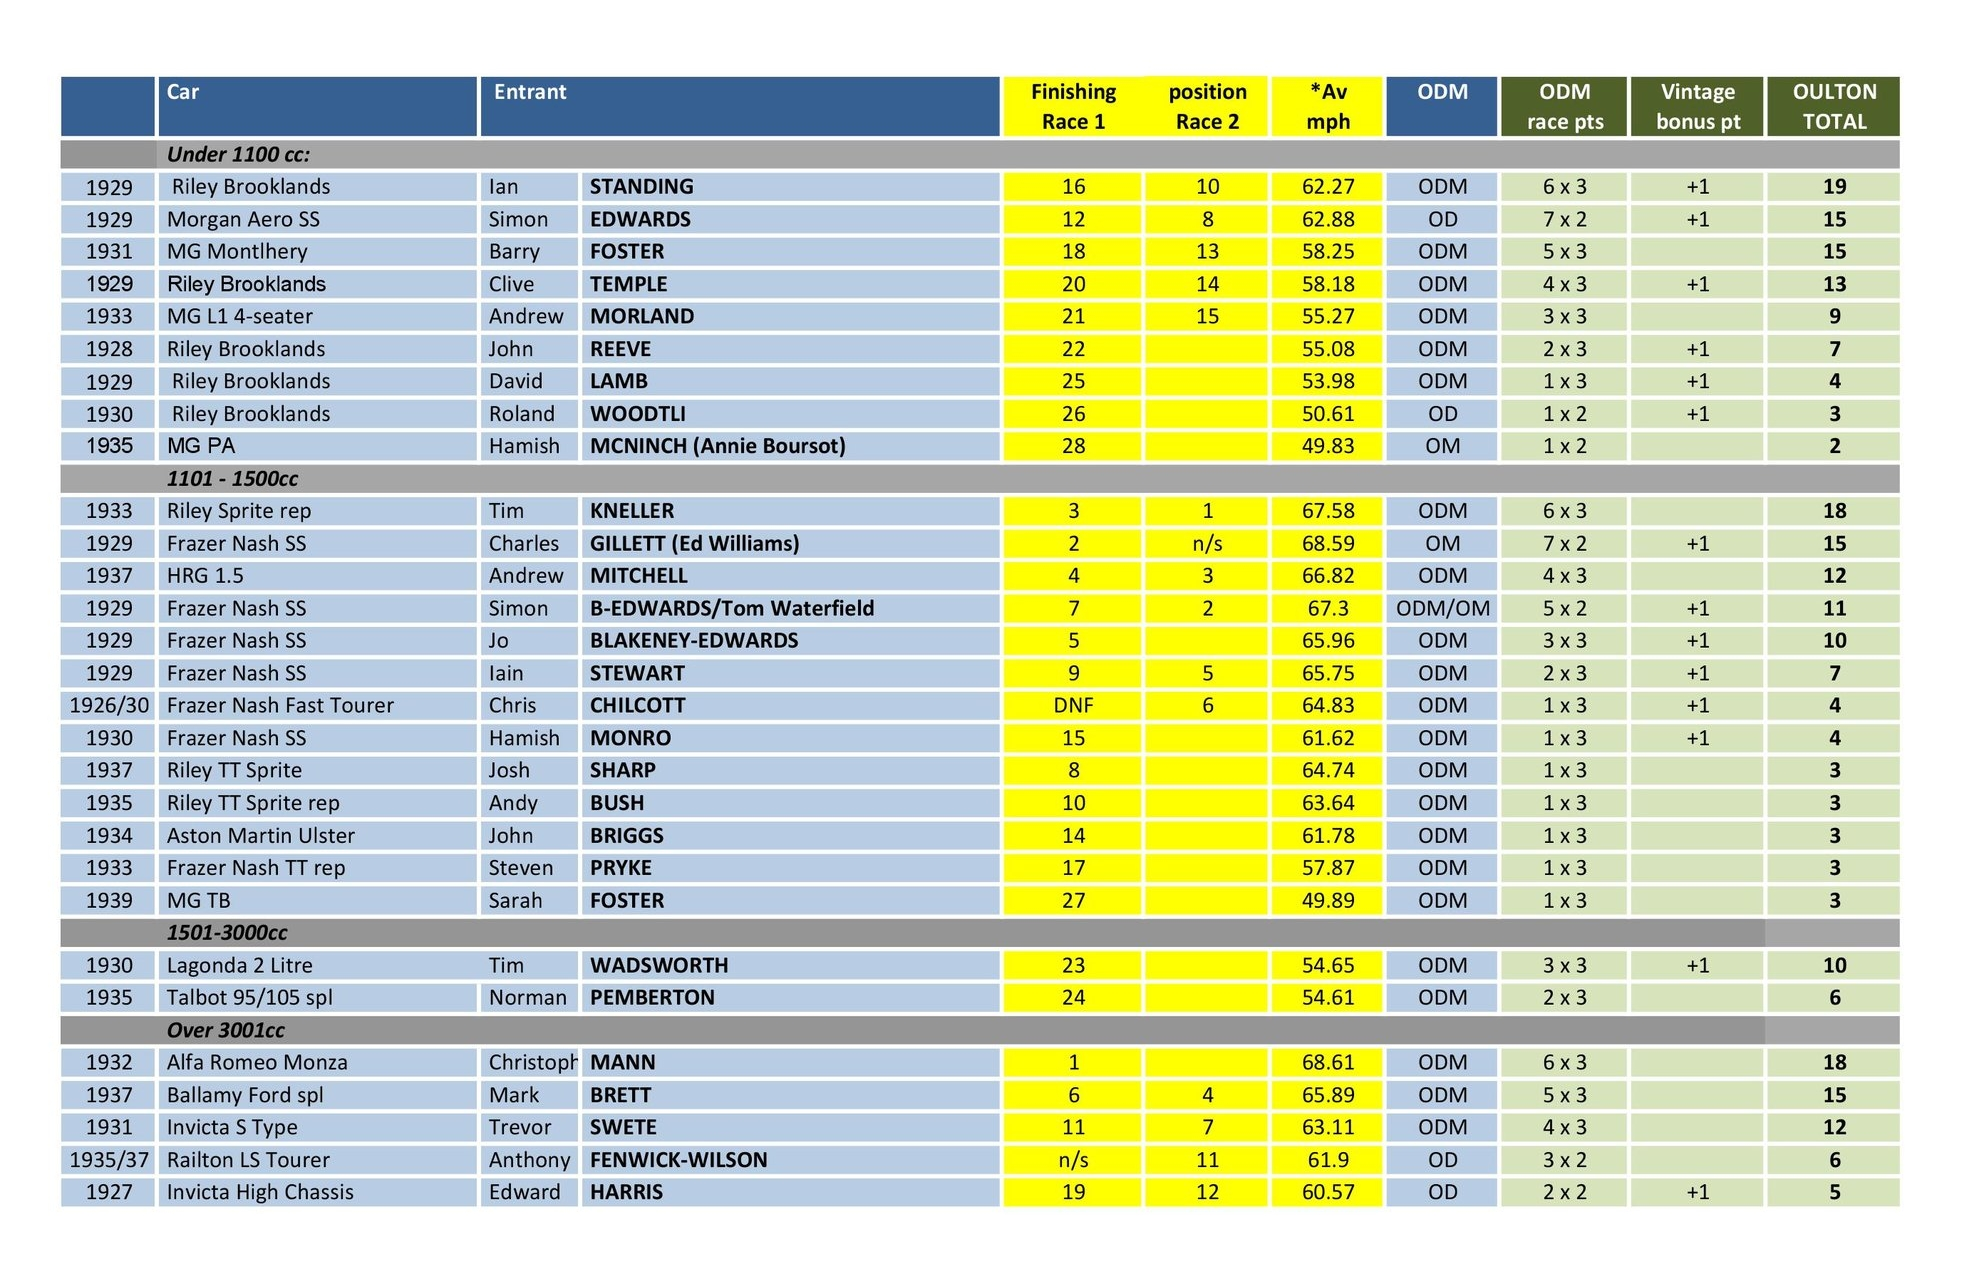 Oulton results 18.jpg